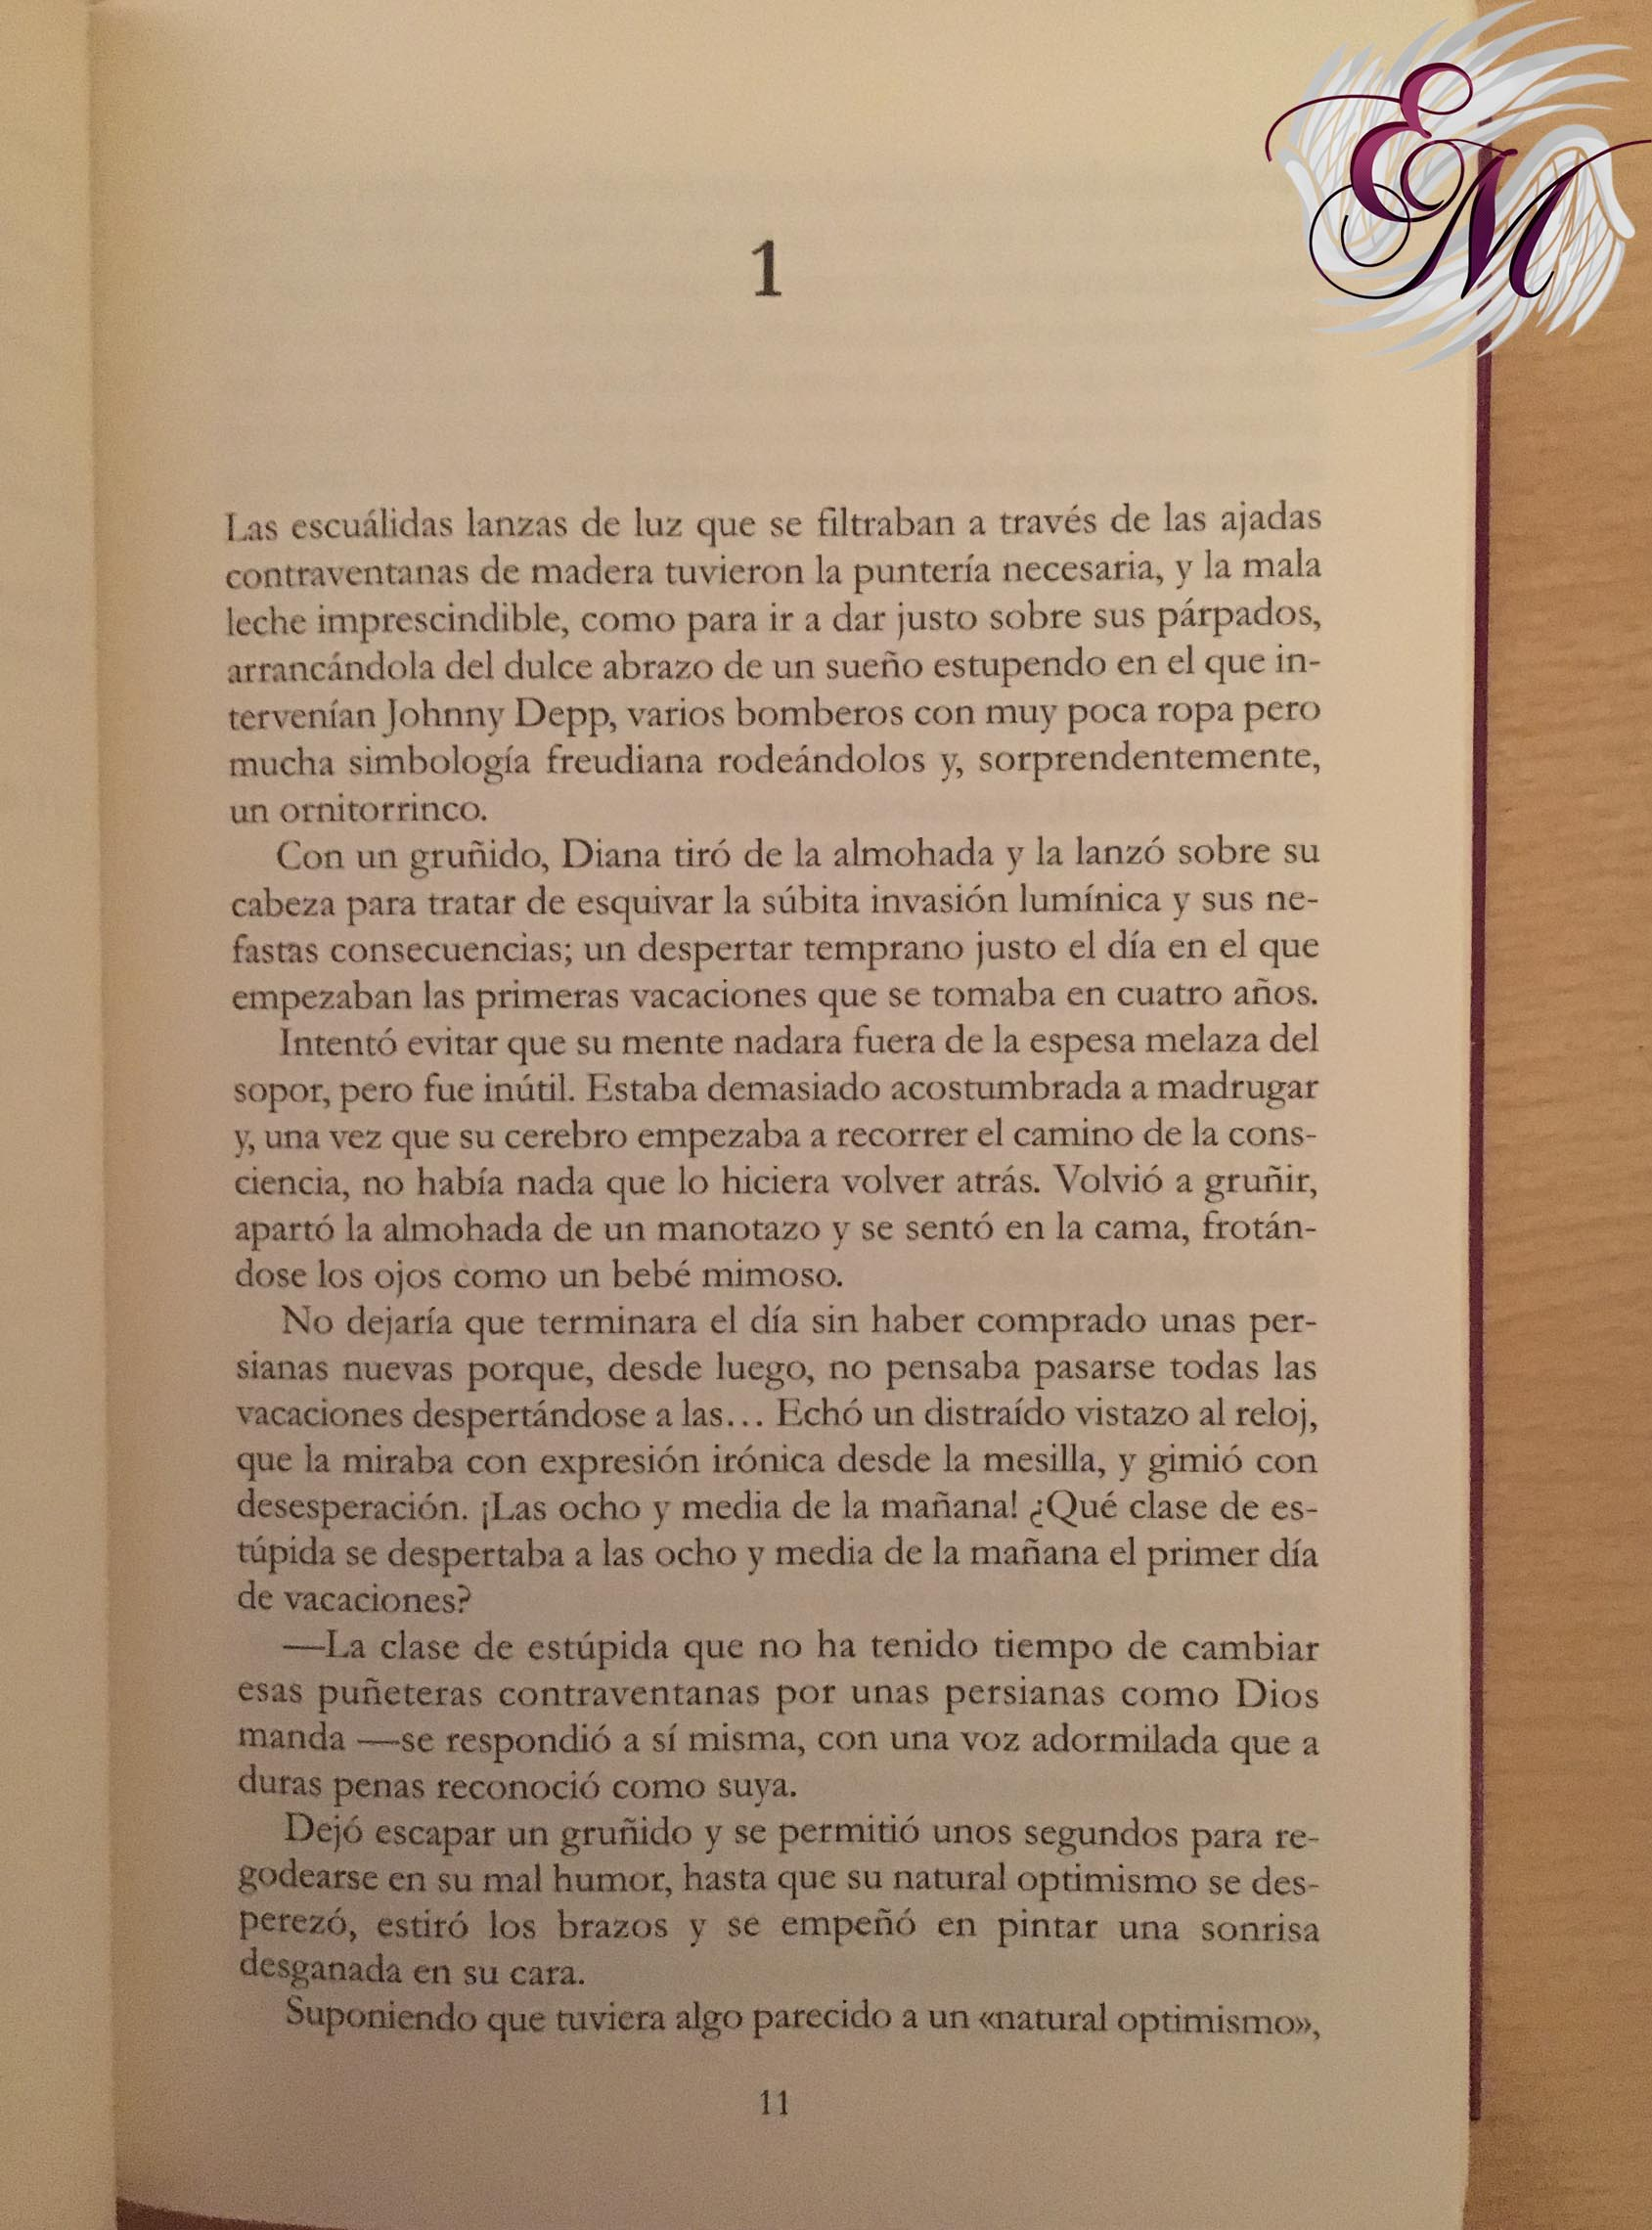 Más allá del velo, de Silvia Barbeito - Reseña